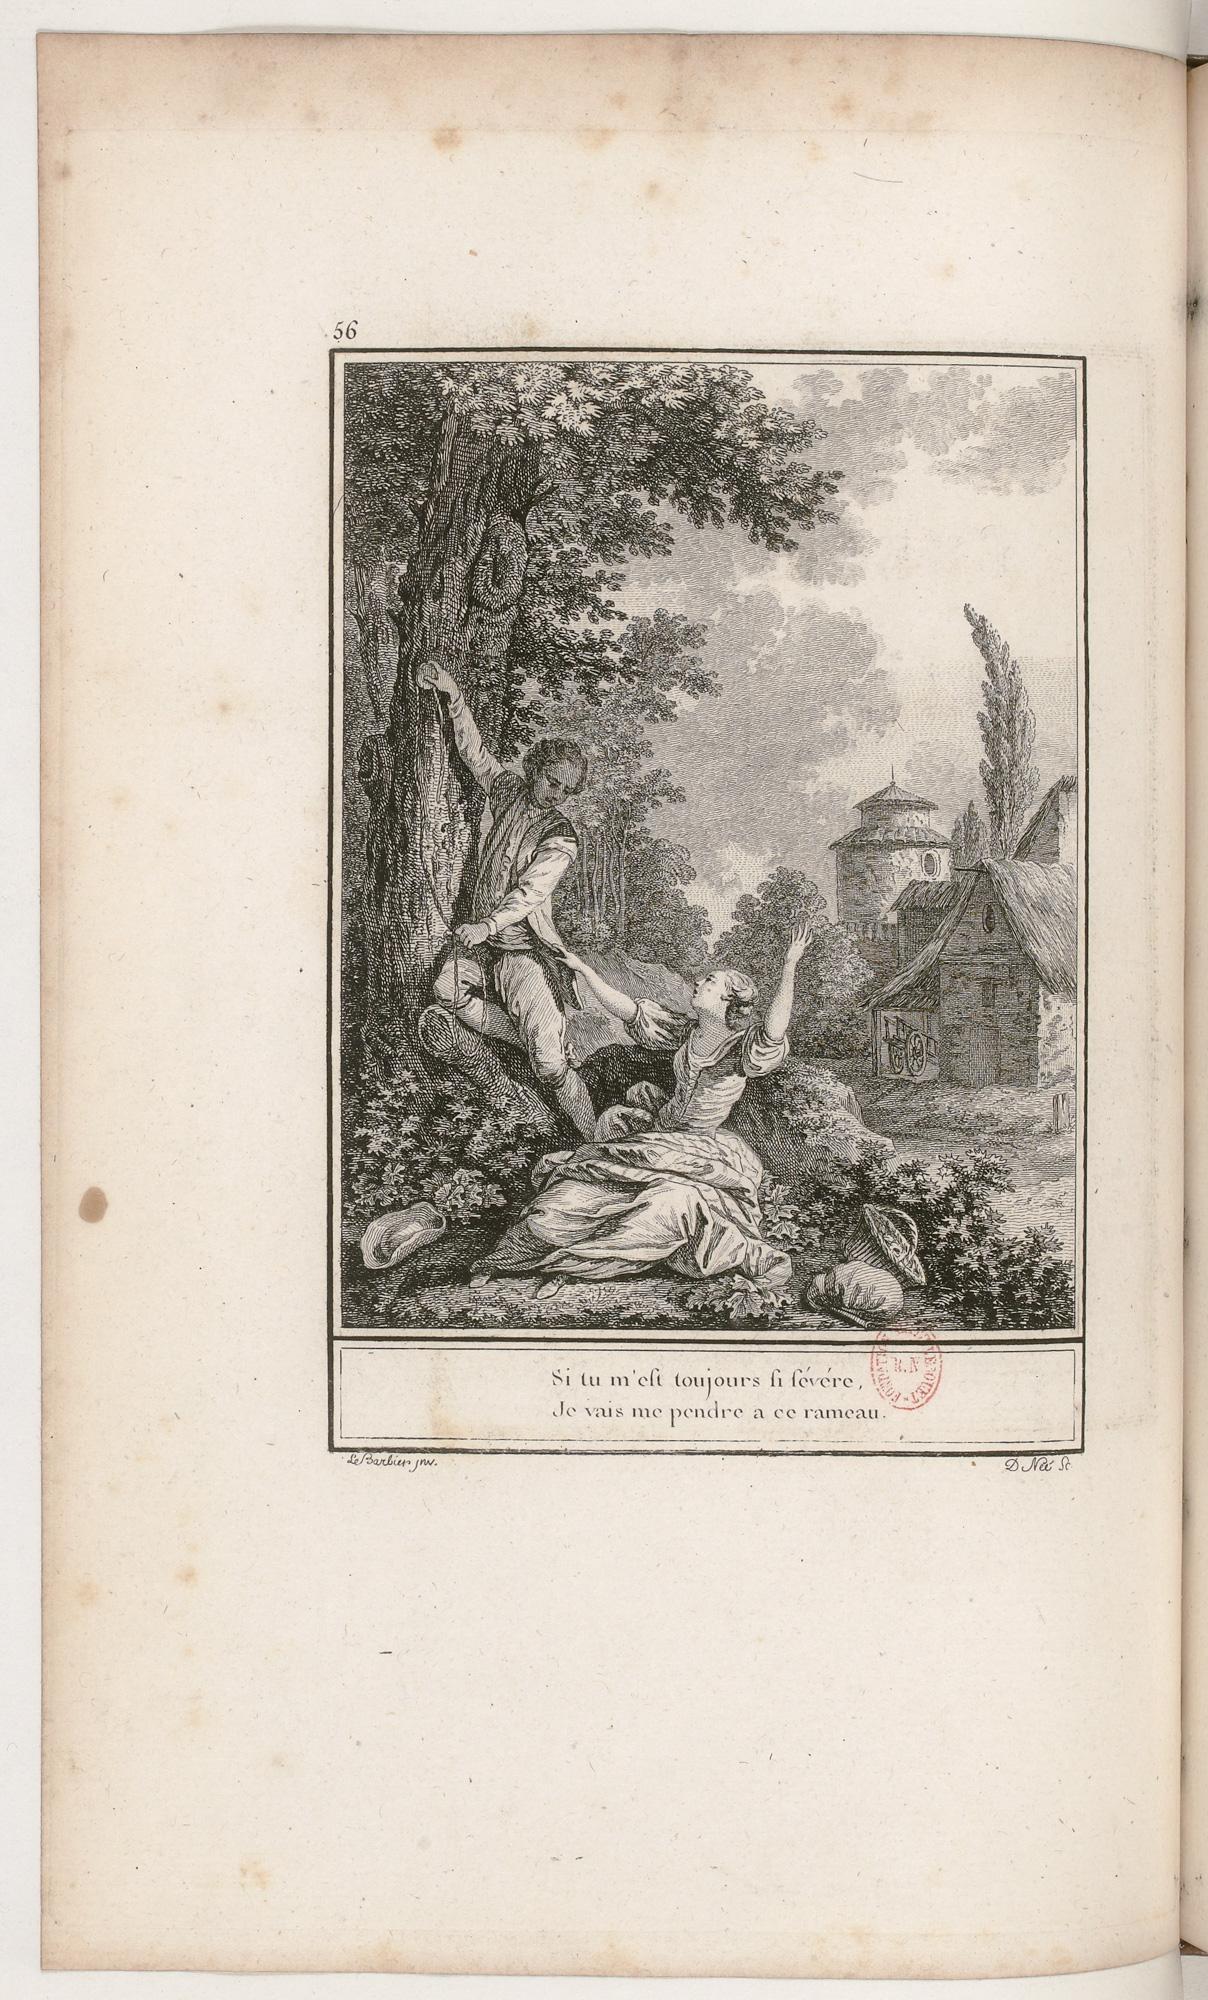 S.3.10 L'heureuse menace,1772, Image